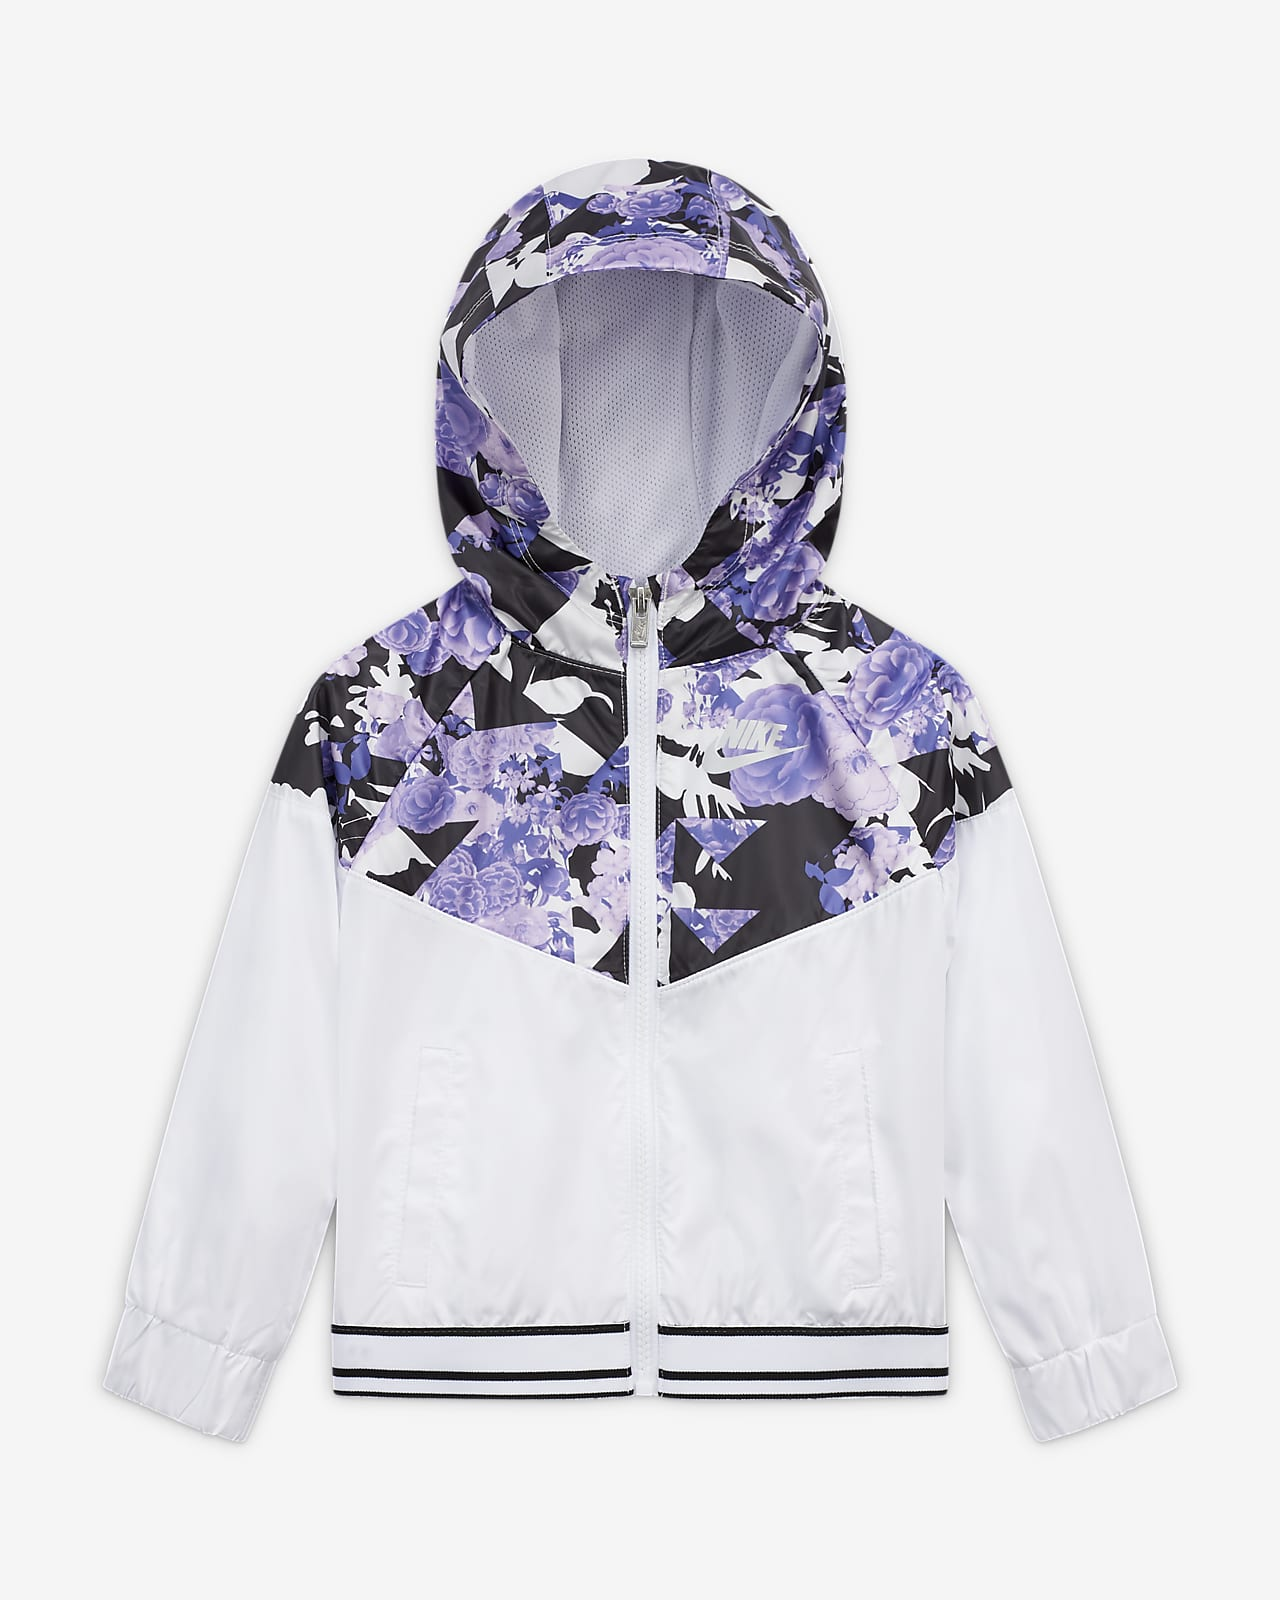 Giacca con zip a tutta lunghezza Nike Sportswear Windrunner - Bimbi piccoli